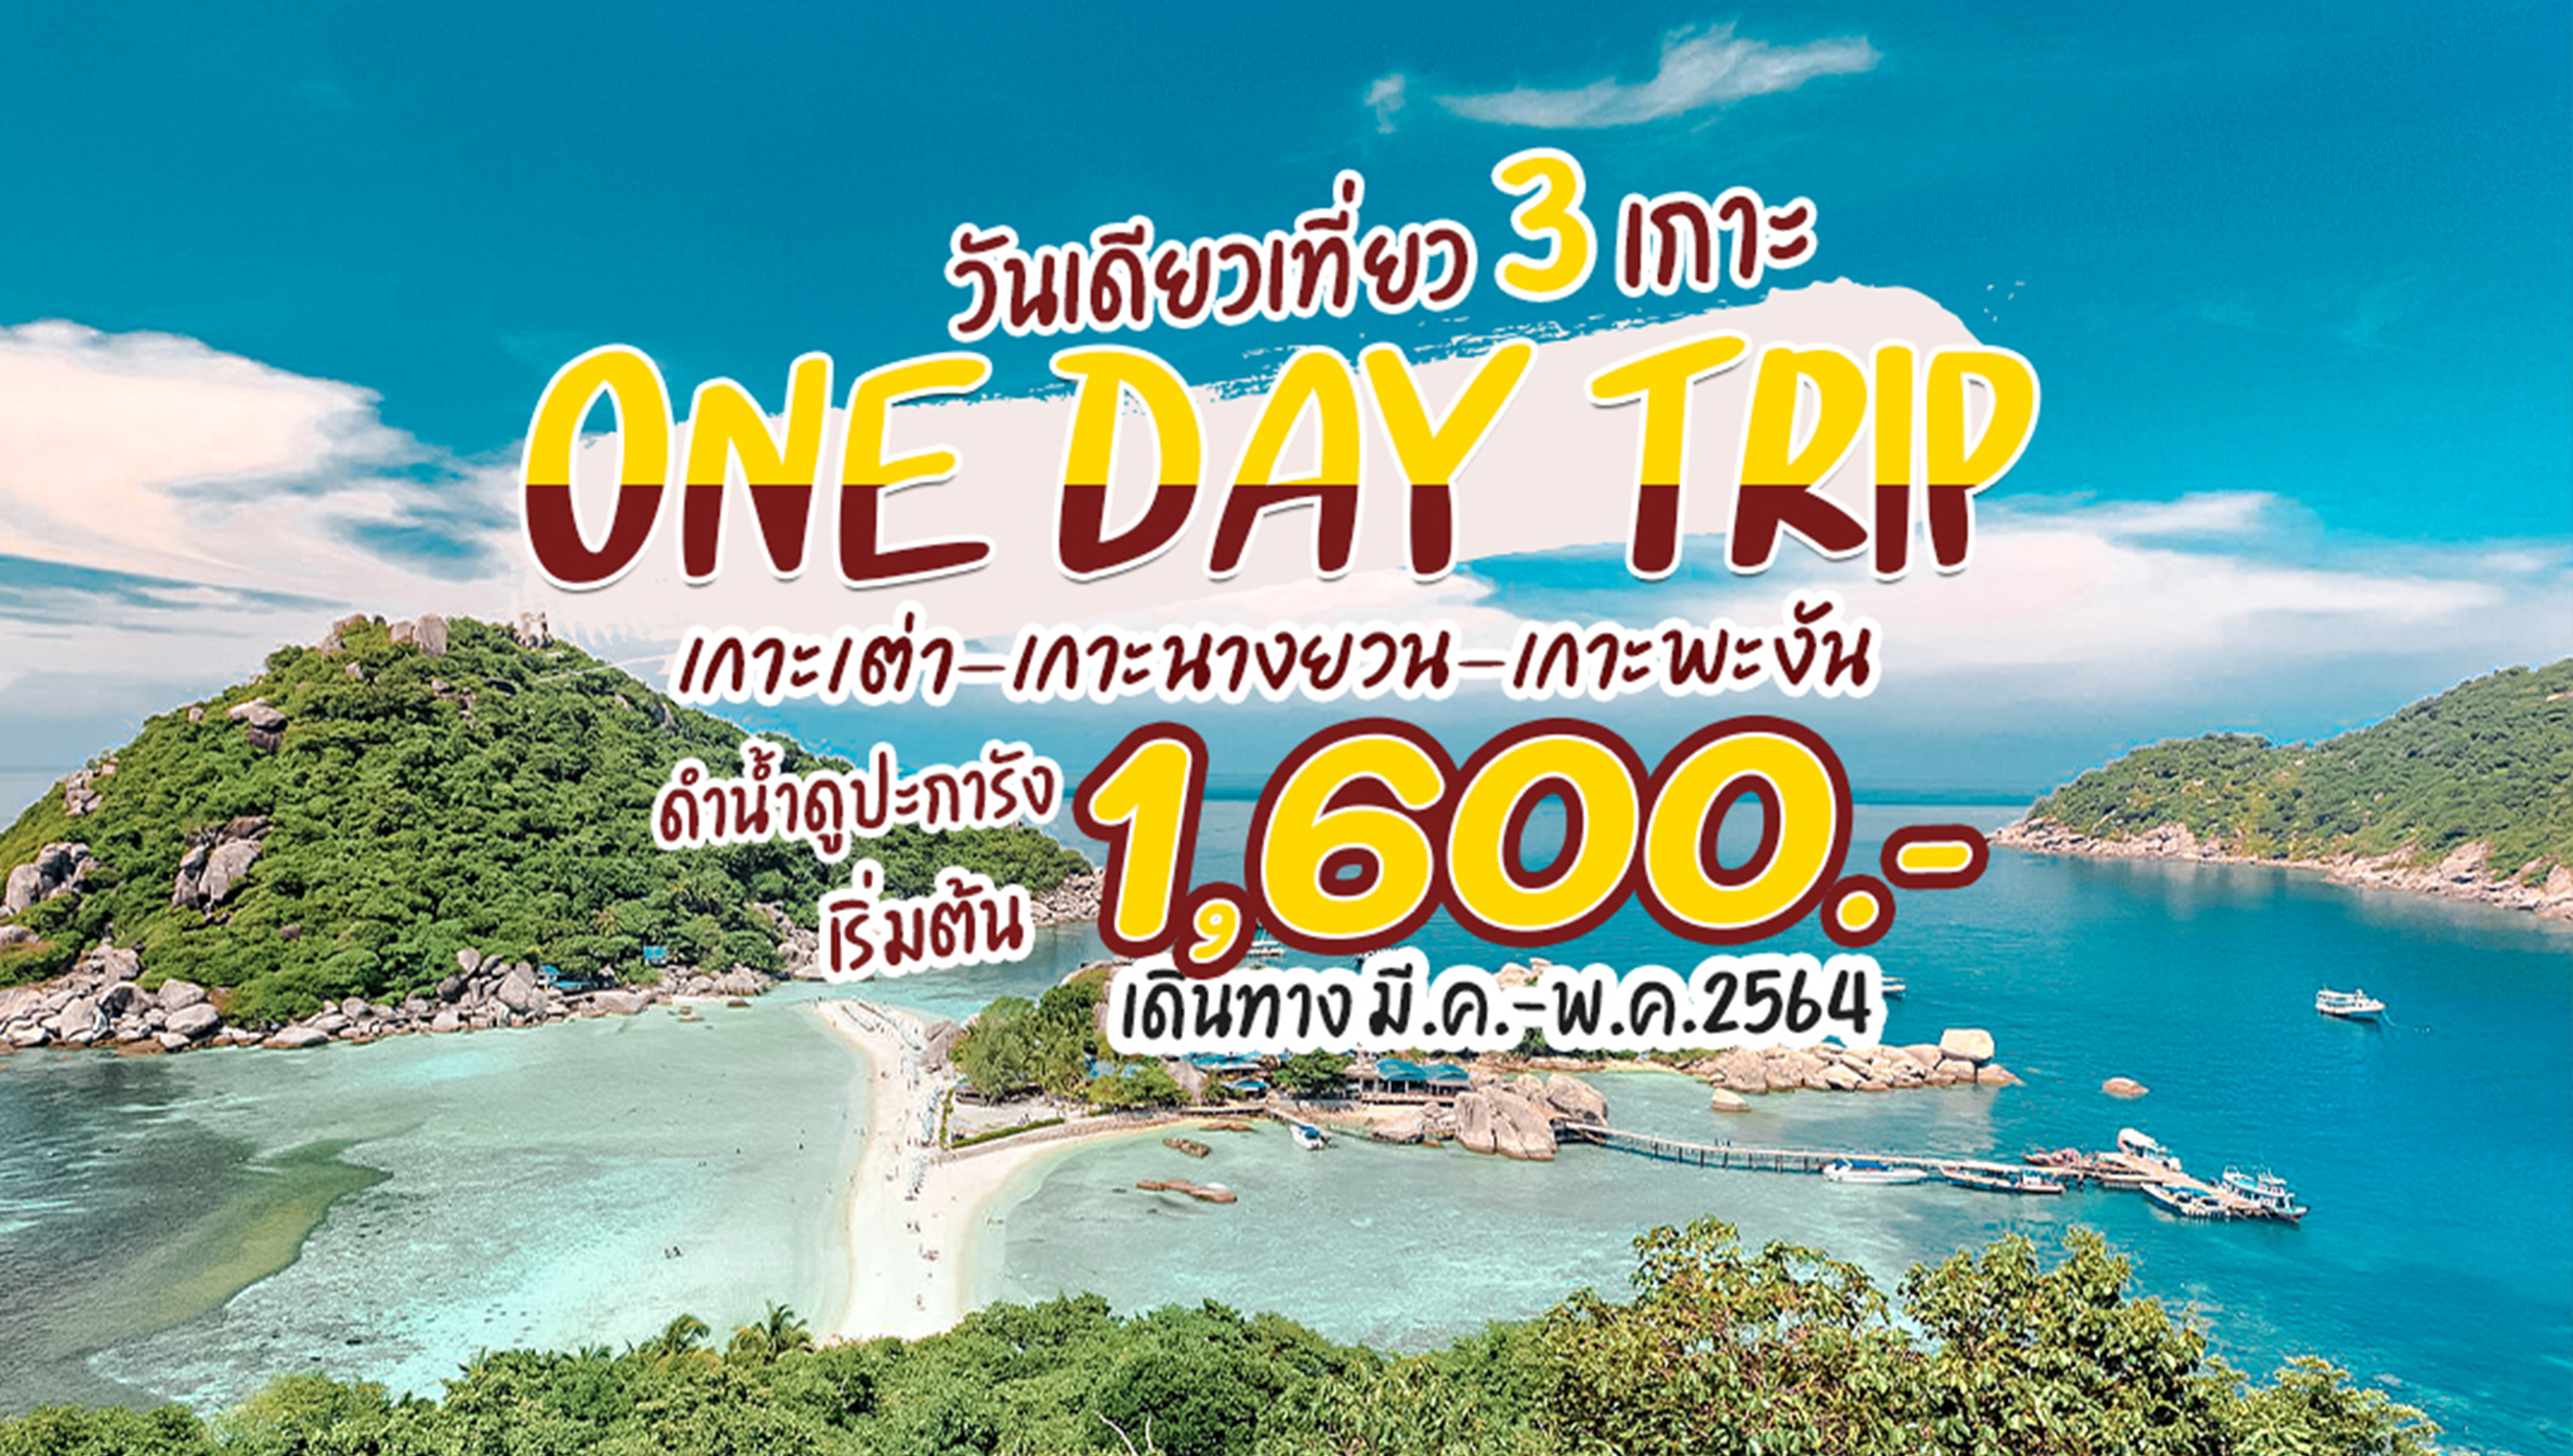 one day trip เกาะเต่า เกาะนางยวน เกาะพะงัน